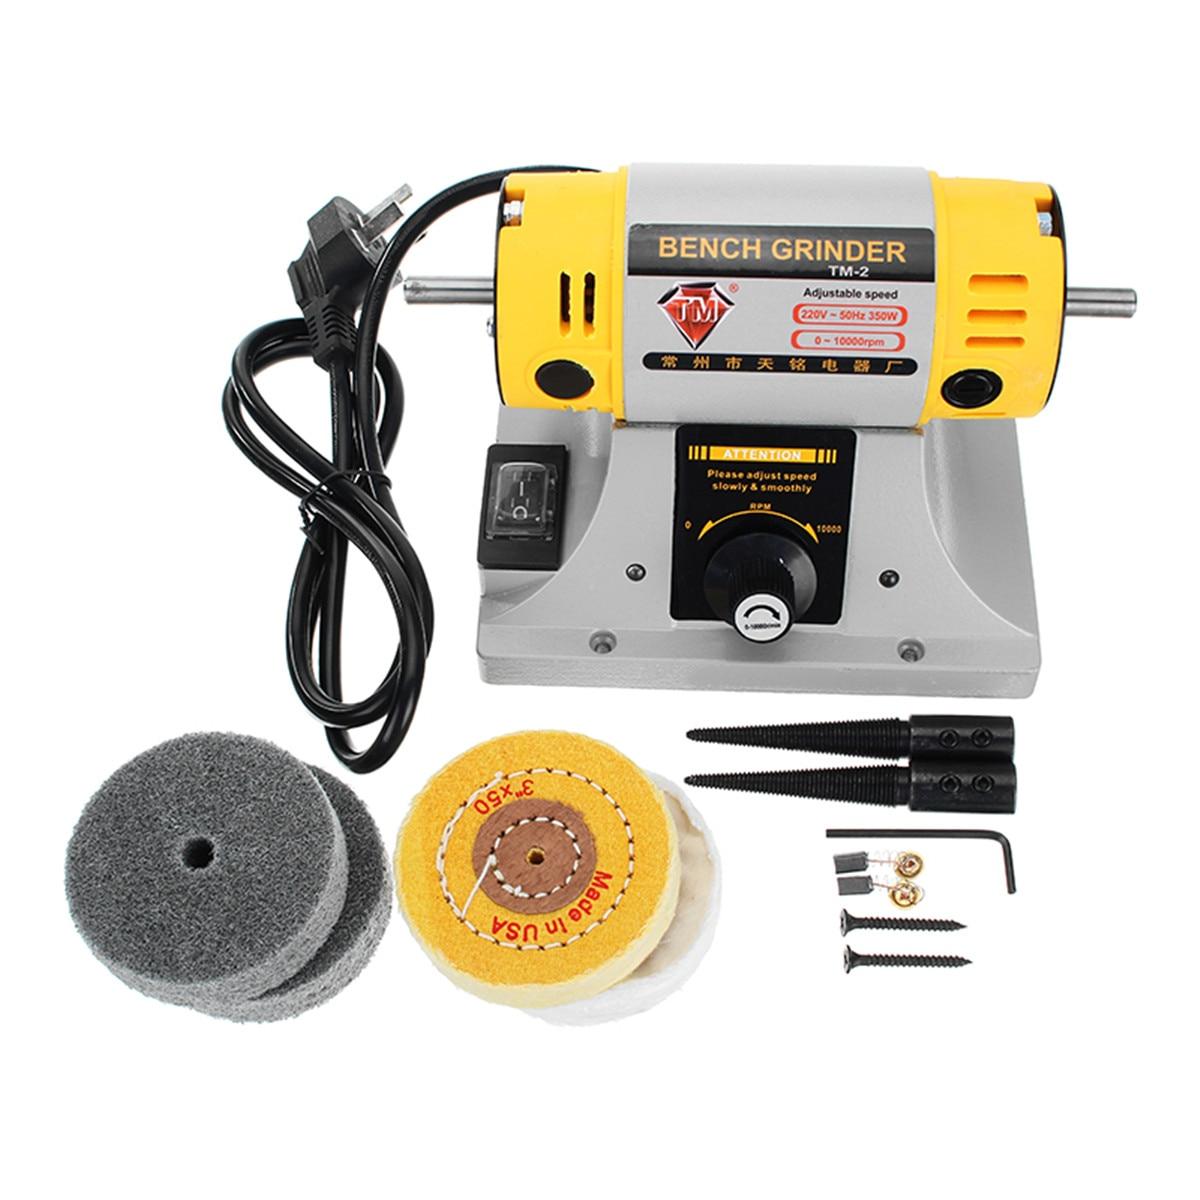 350W 220V Multi purpose Mini Benchs Grinder Polishing Machine Kit For Jewelry Dental Jewelry Motor Lathe Benchs Grinder Kit Set